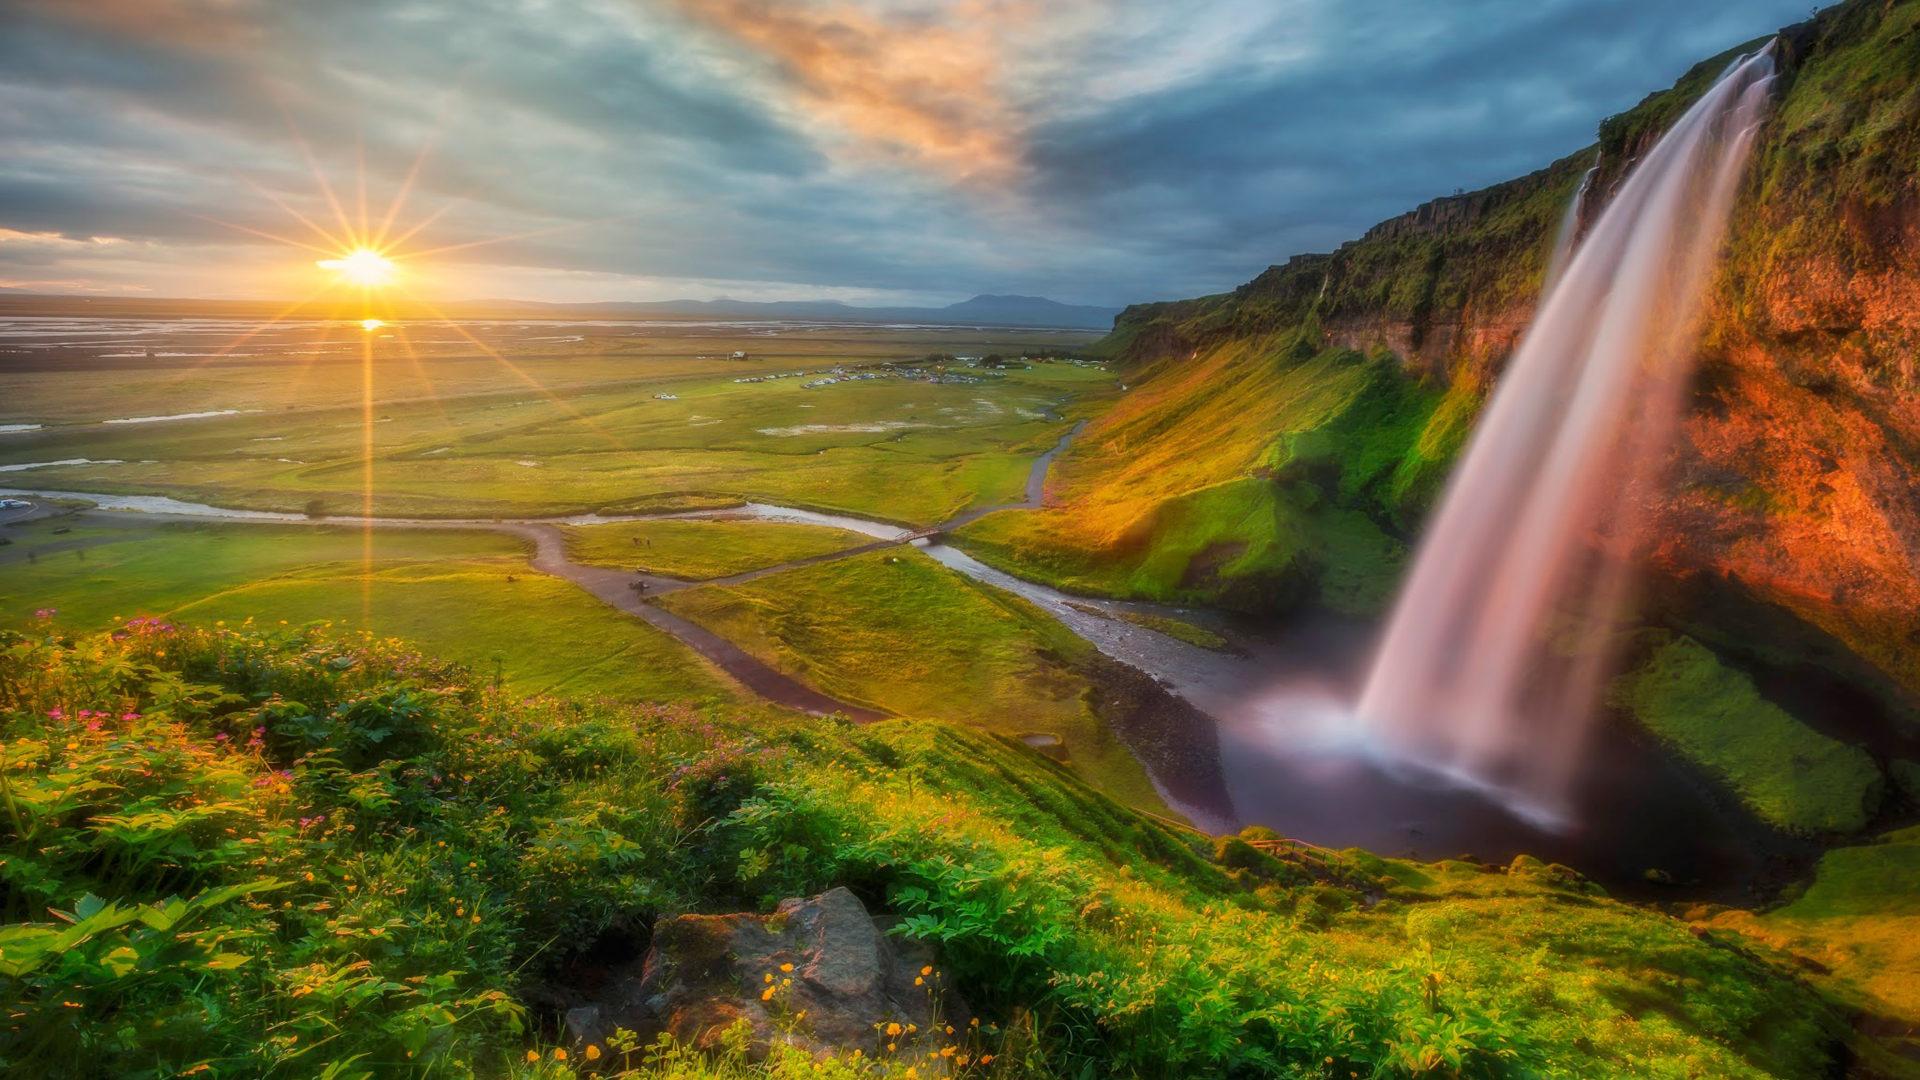 Water Fall Hd Wallpaper 4k Photo Wallpaper Hd Waterfall River Valley Sunset